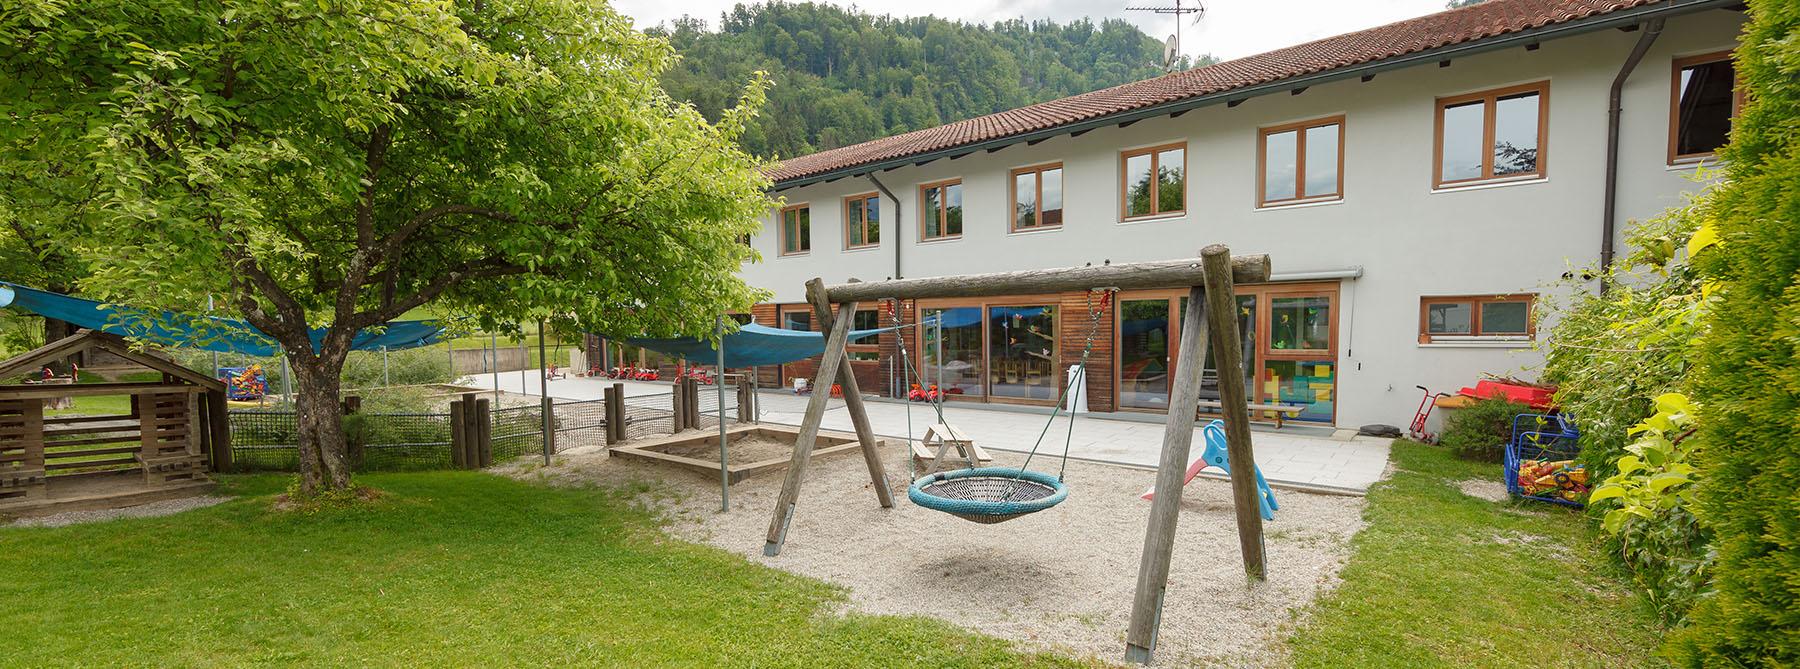 Audorfer-Kindernest2-Kindergarten-Kinderkrippe-Kinderhort